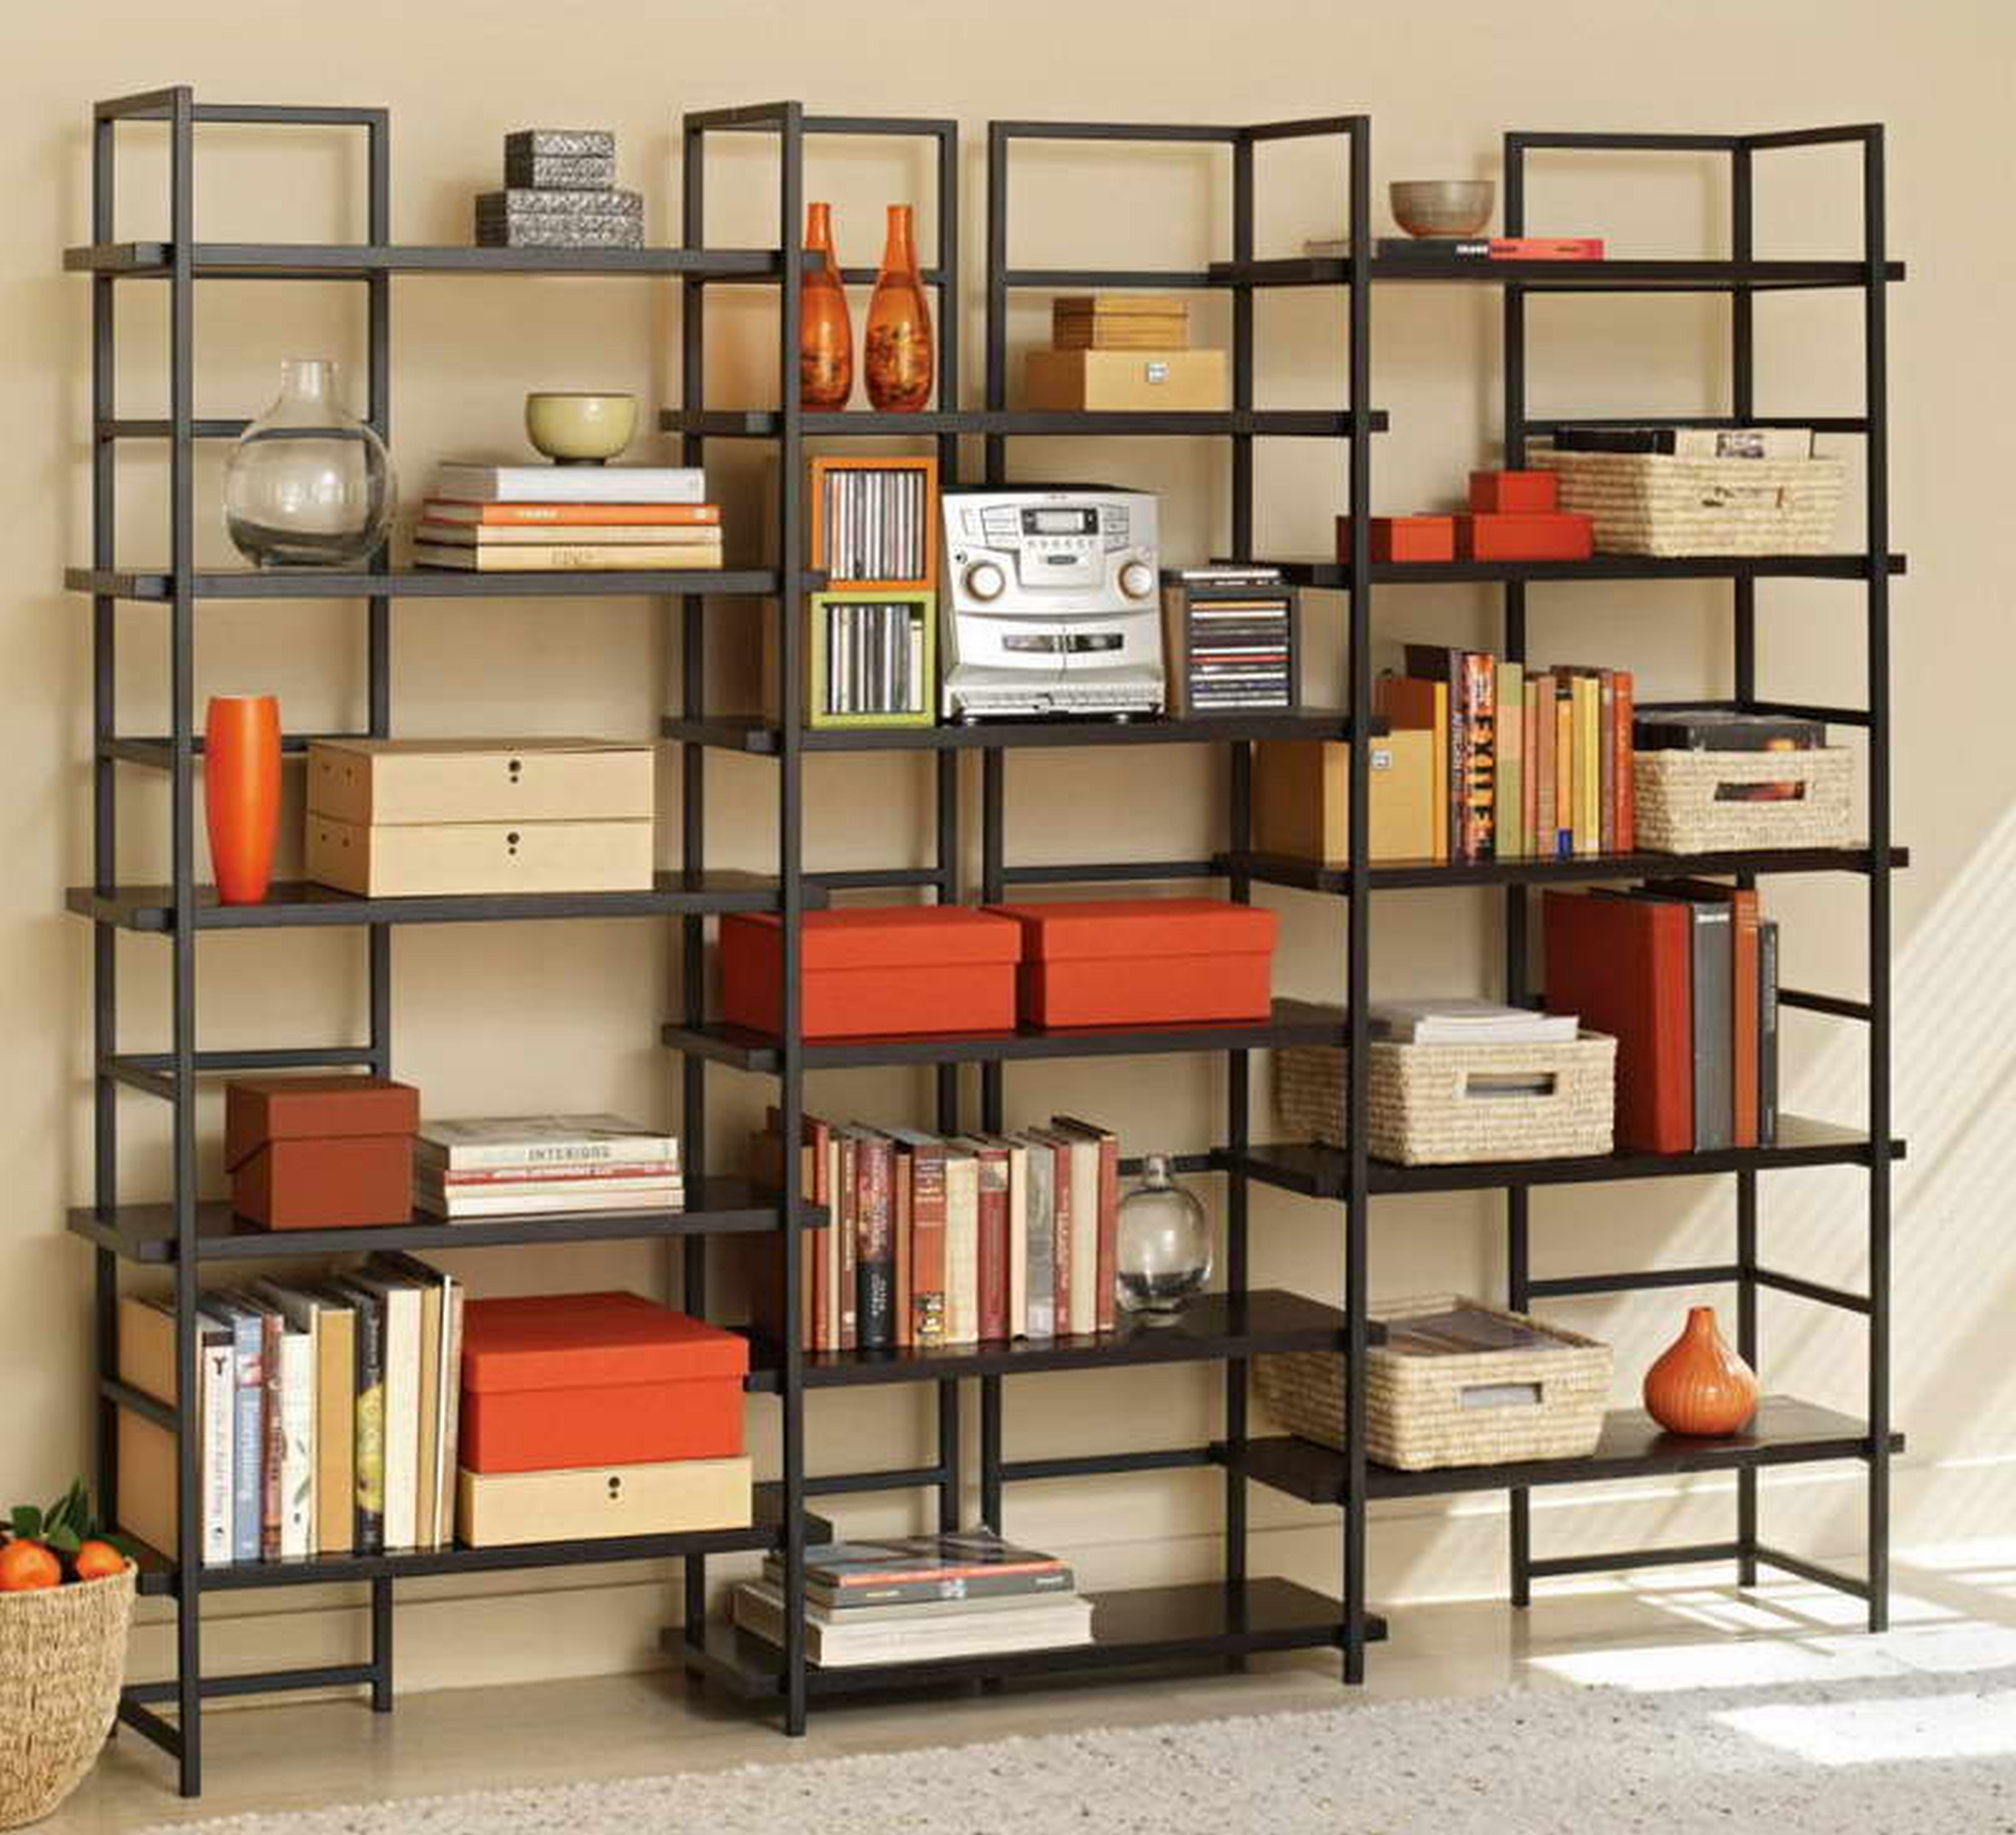 Most Popular Bookshelf (View 2 of 15)